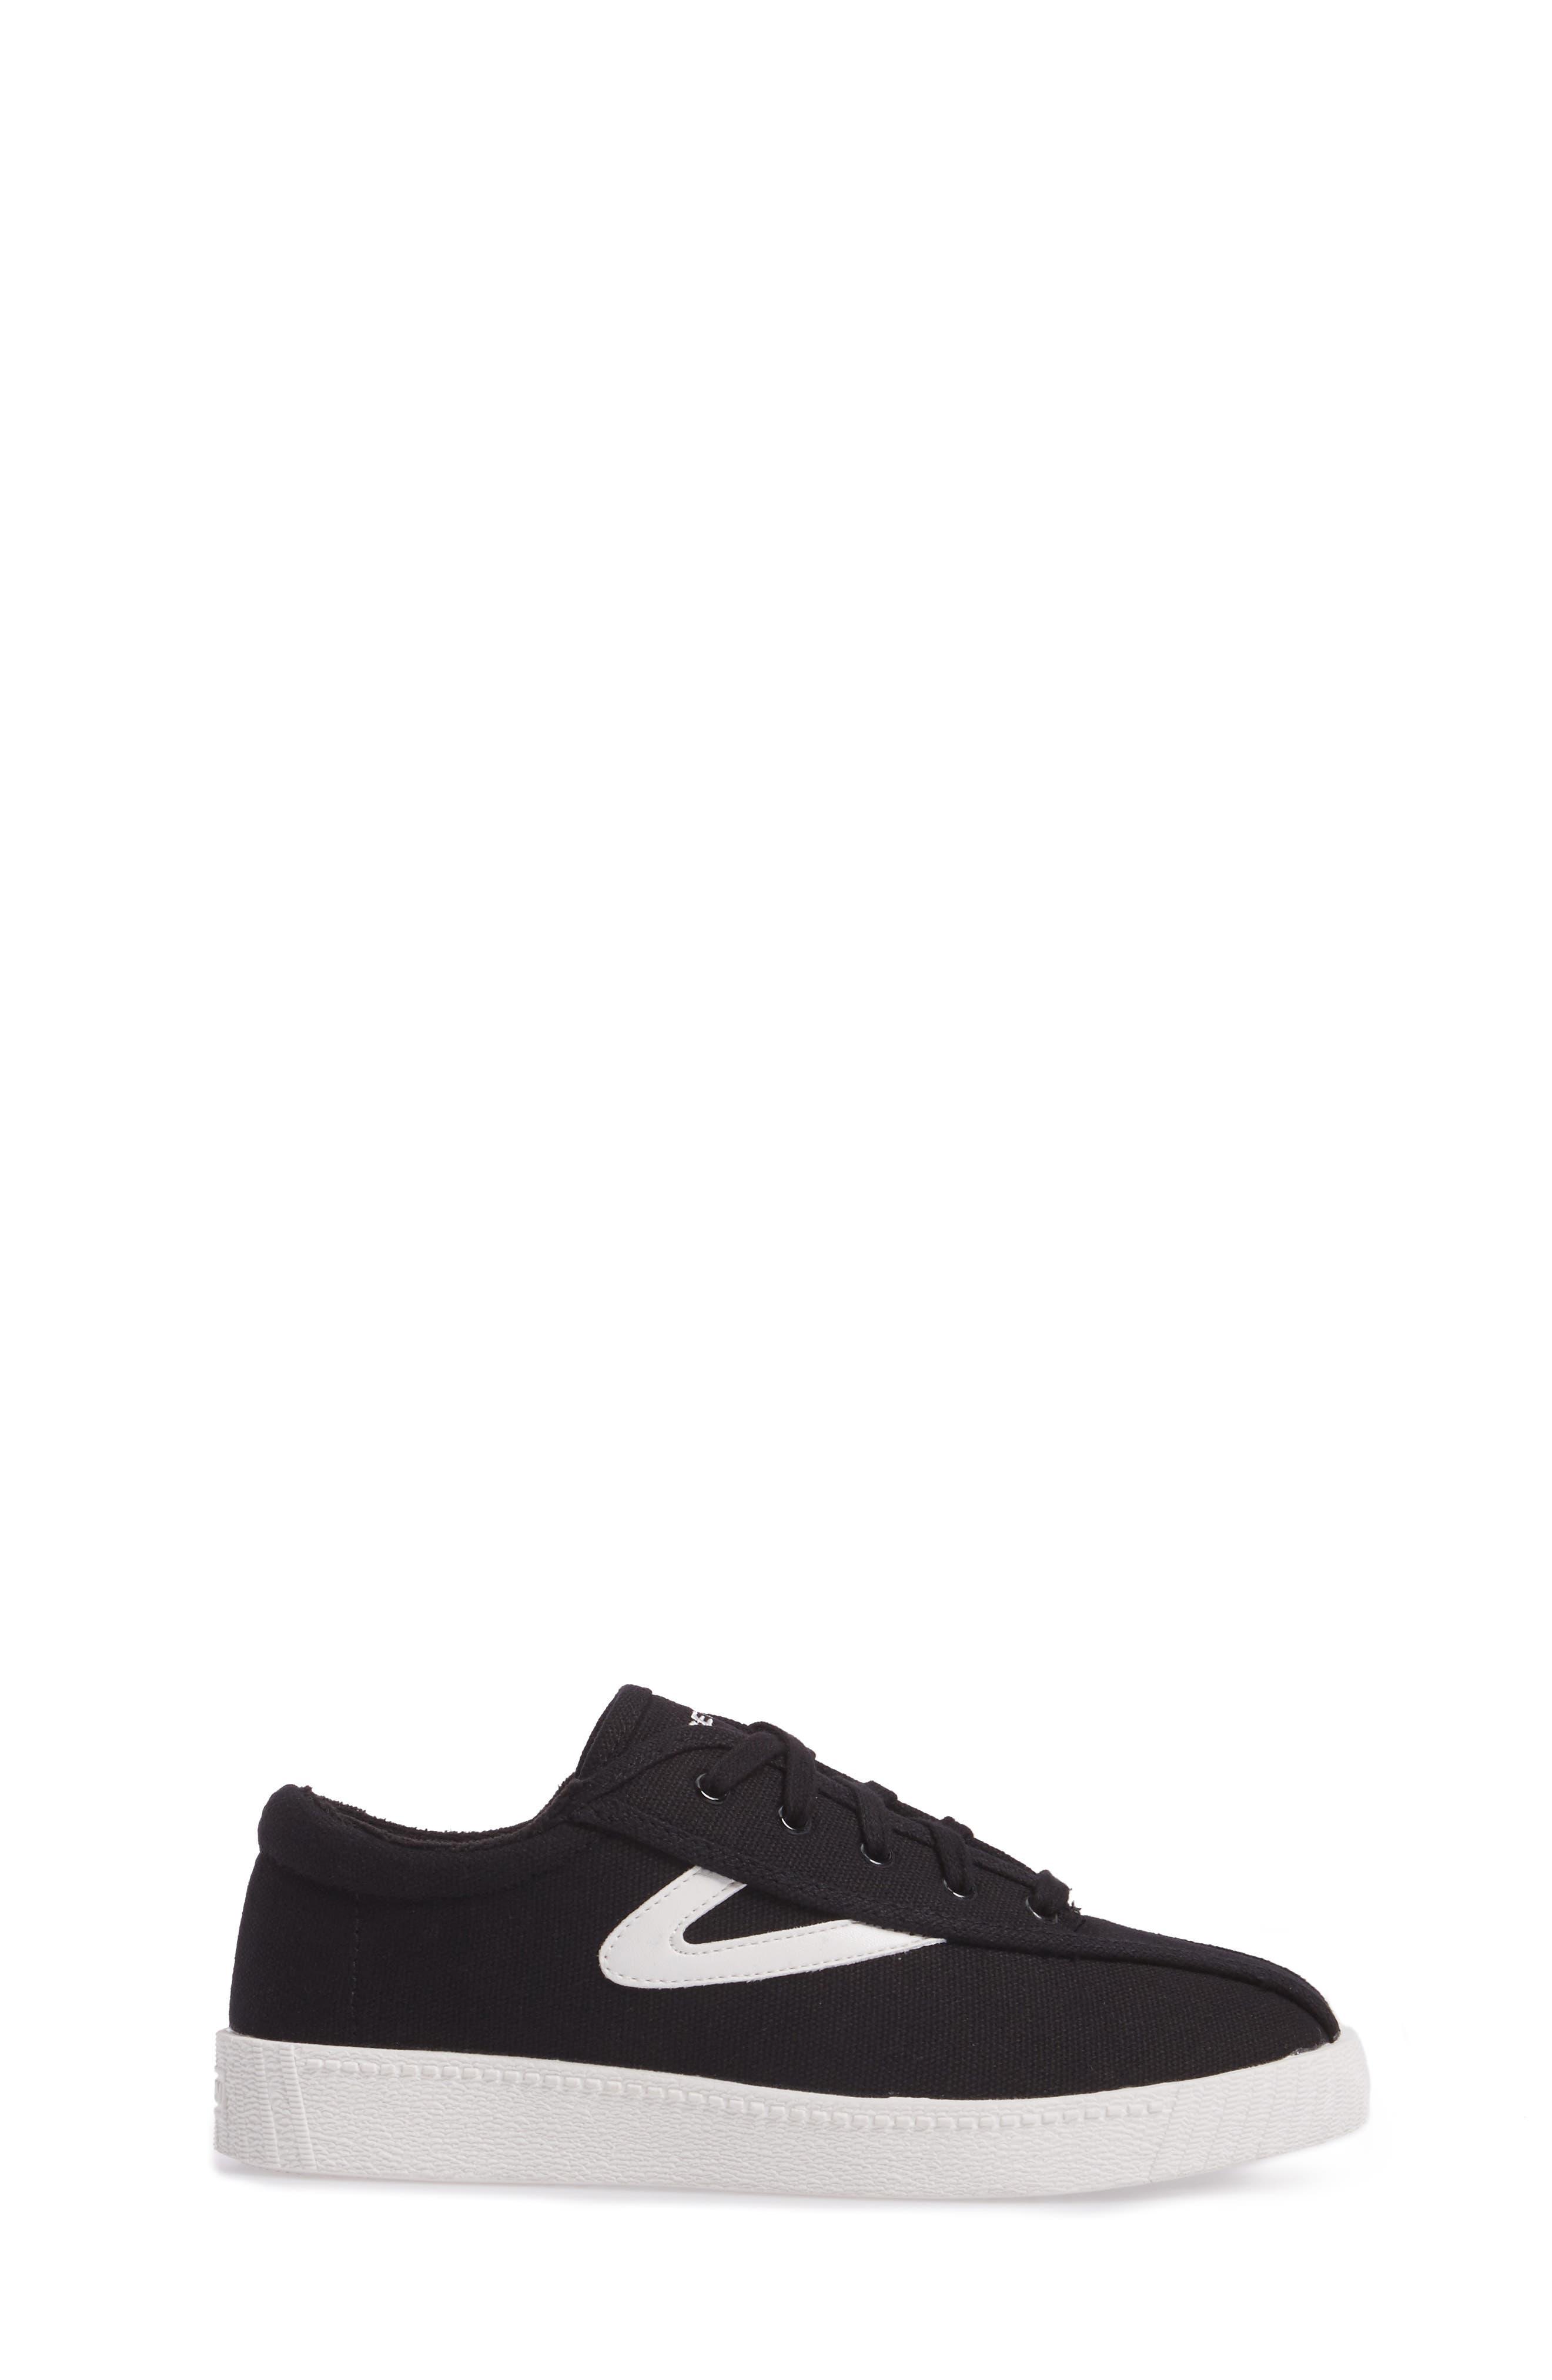 Nylite Plus Sneaker,                             Alternate thumbnail 7, color,